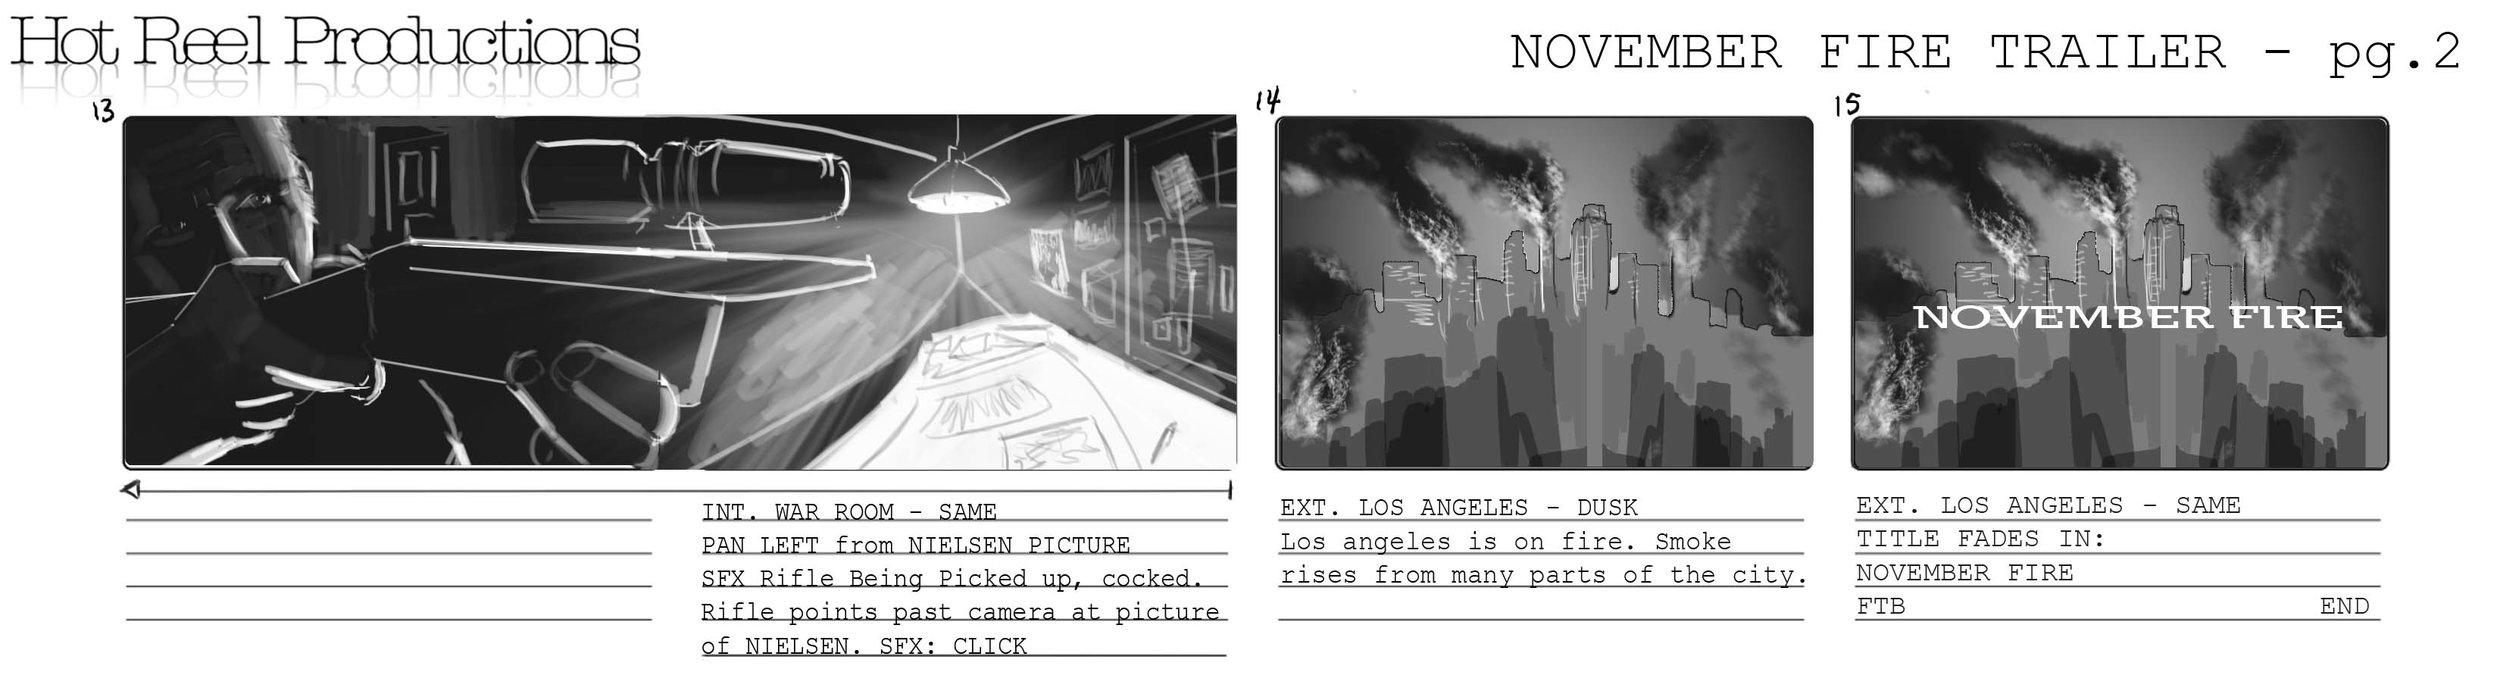 November_Fire_Storyboard_REV3_P2.jpg